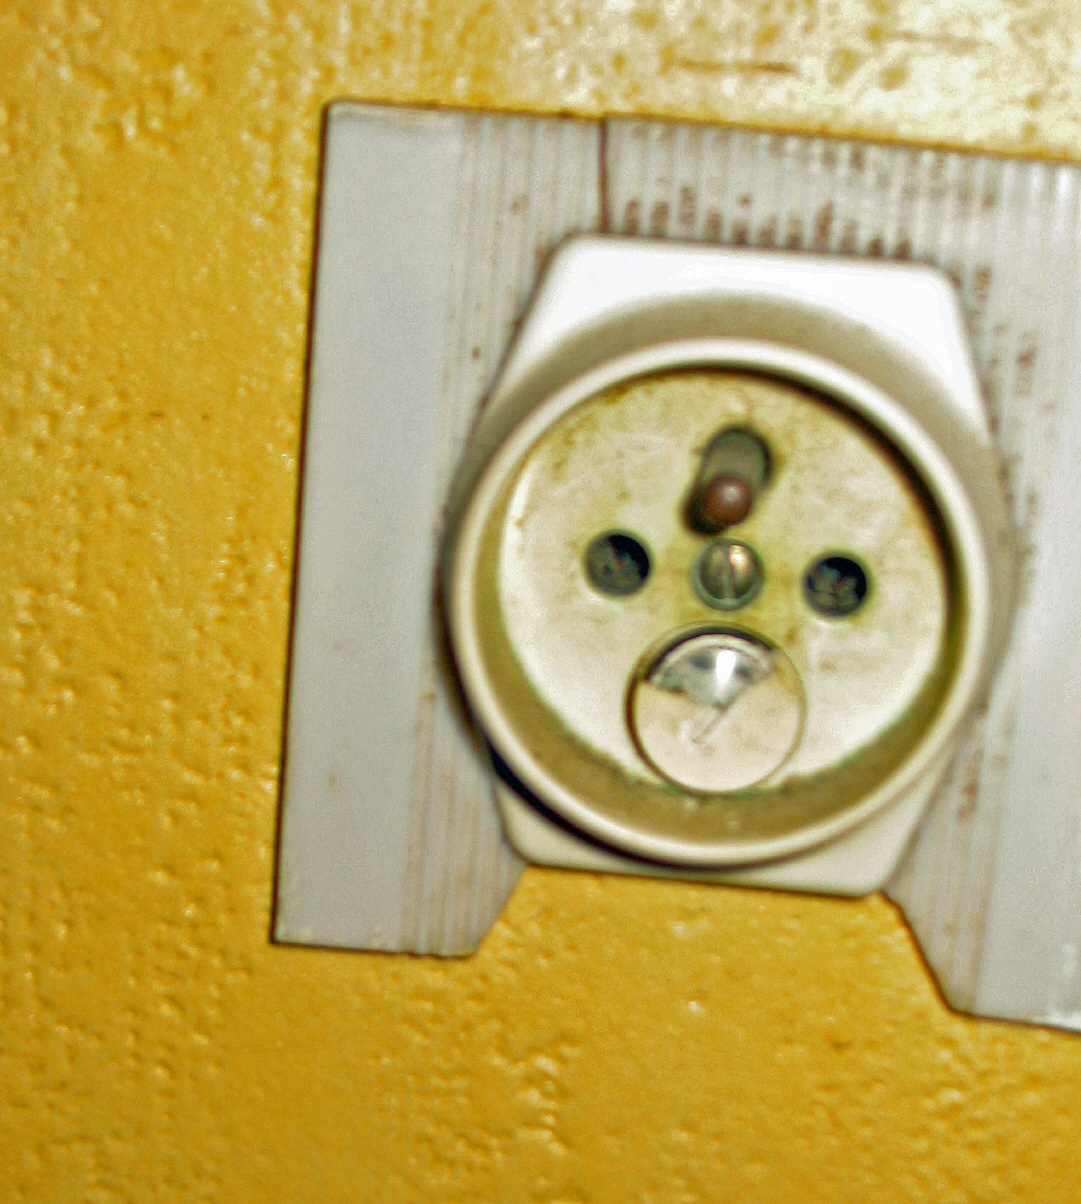 Etat de l 39 installation int rieure electrique - Controle de l installation electrique ...